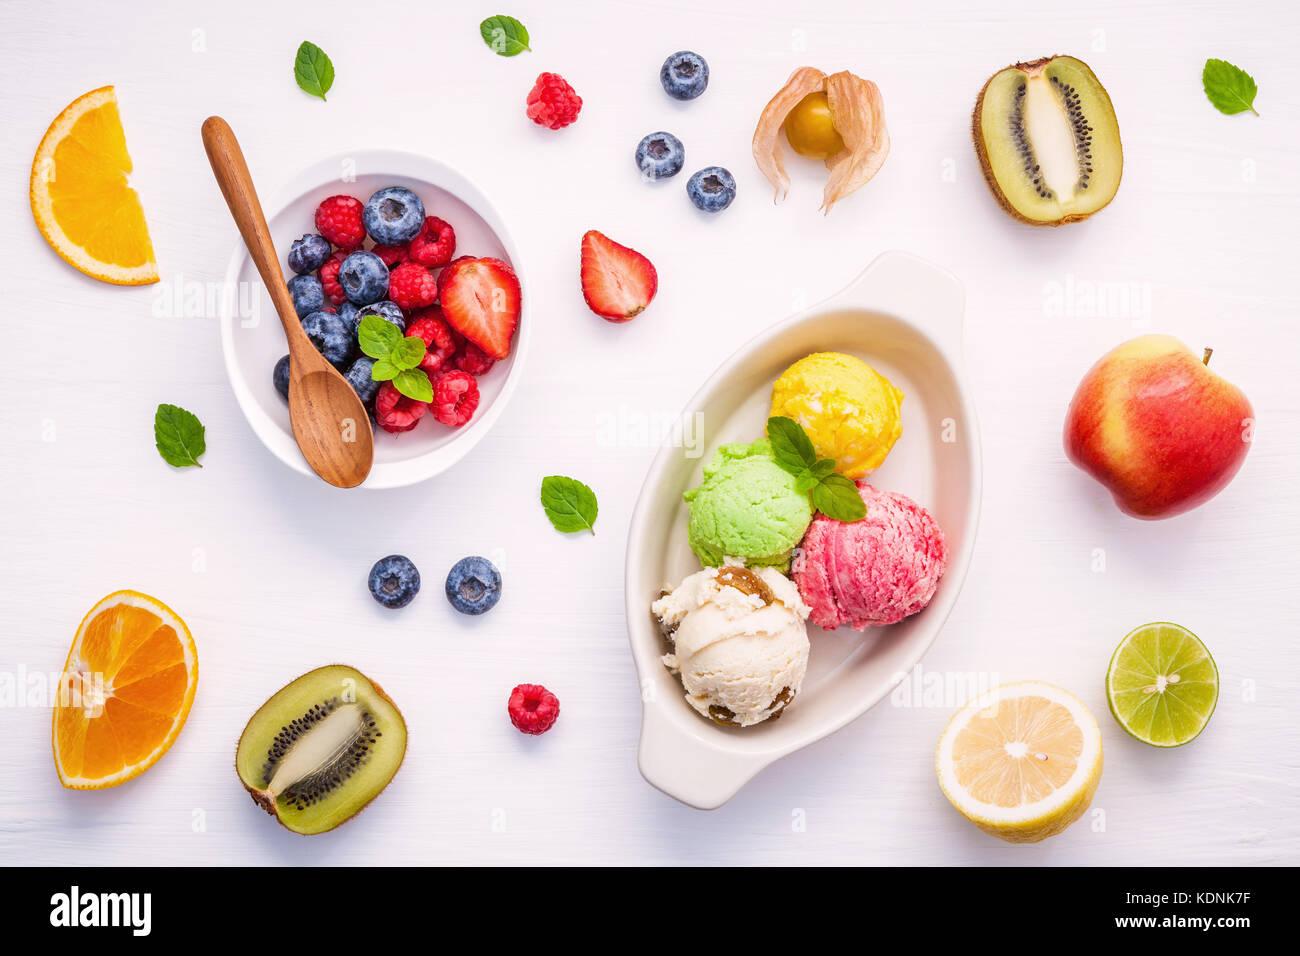 Colorful ice cream with mixed berry and various fruits raspberry ,blueberry ,strawberry ,orange slice , halve kiwi - Stock Image